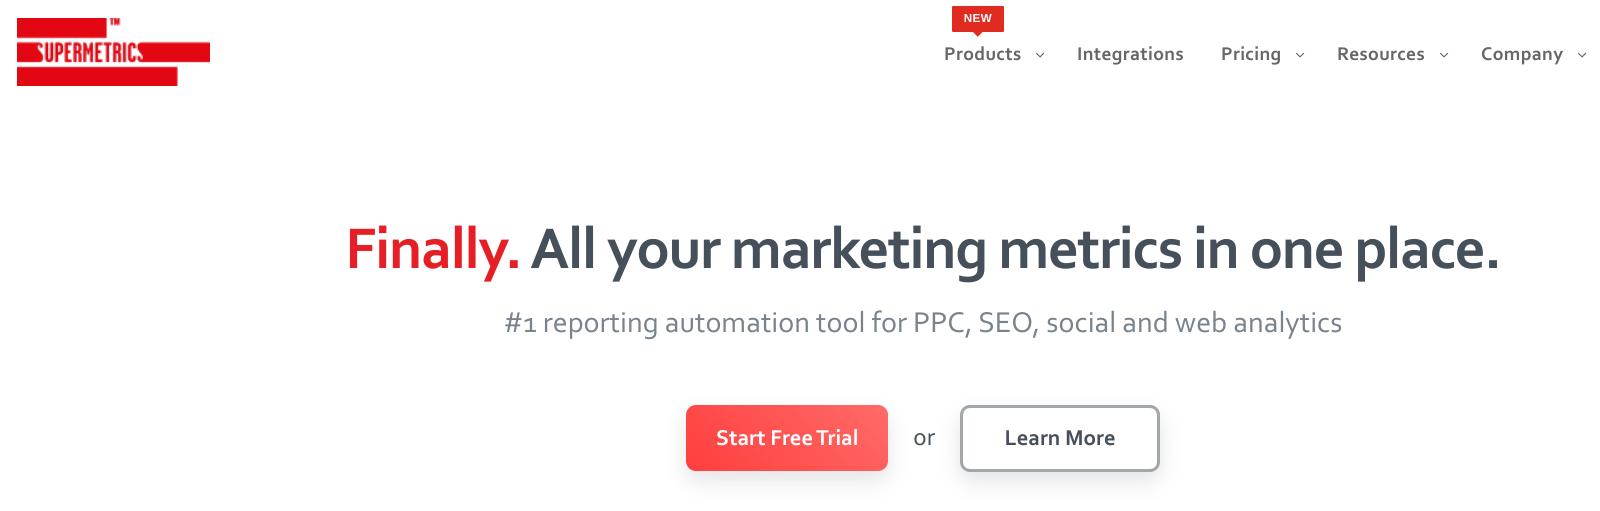 marketing metrics